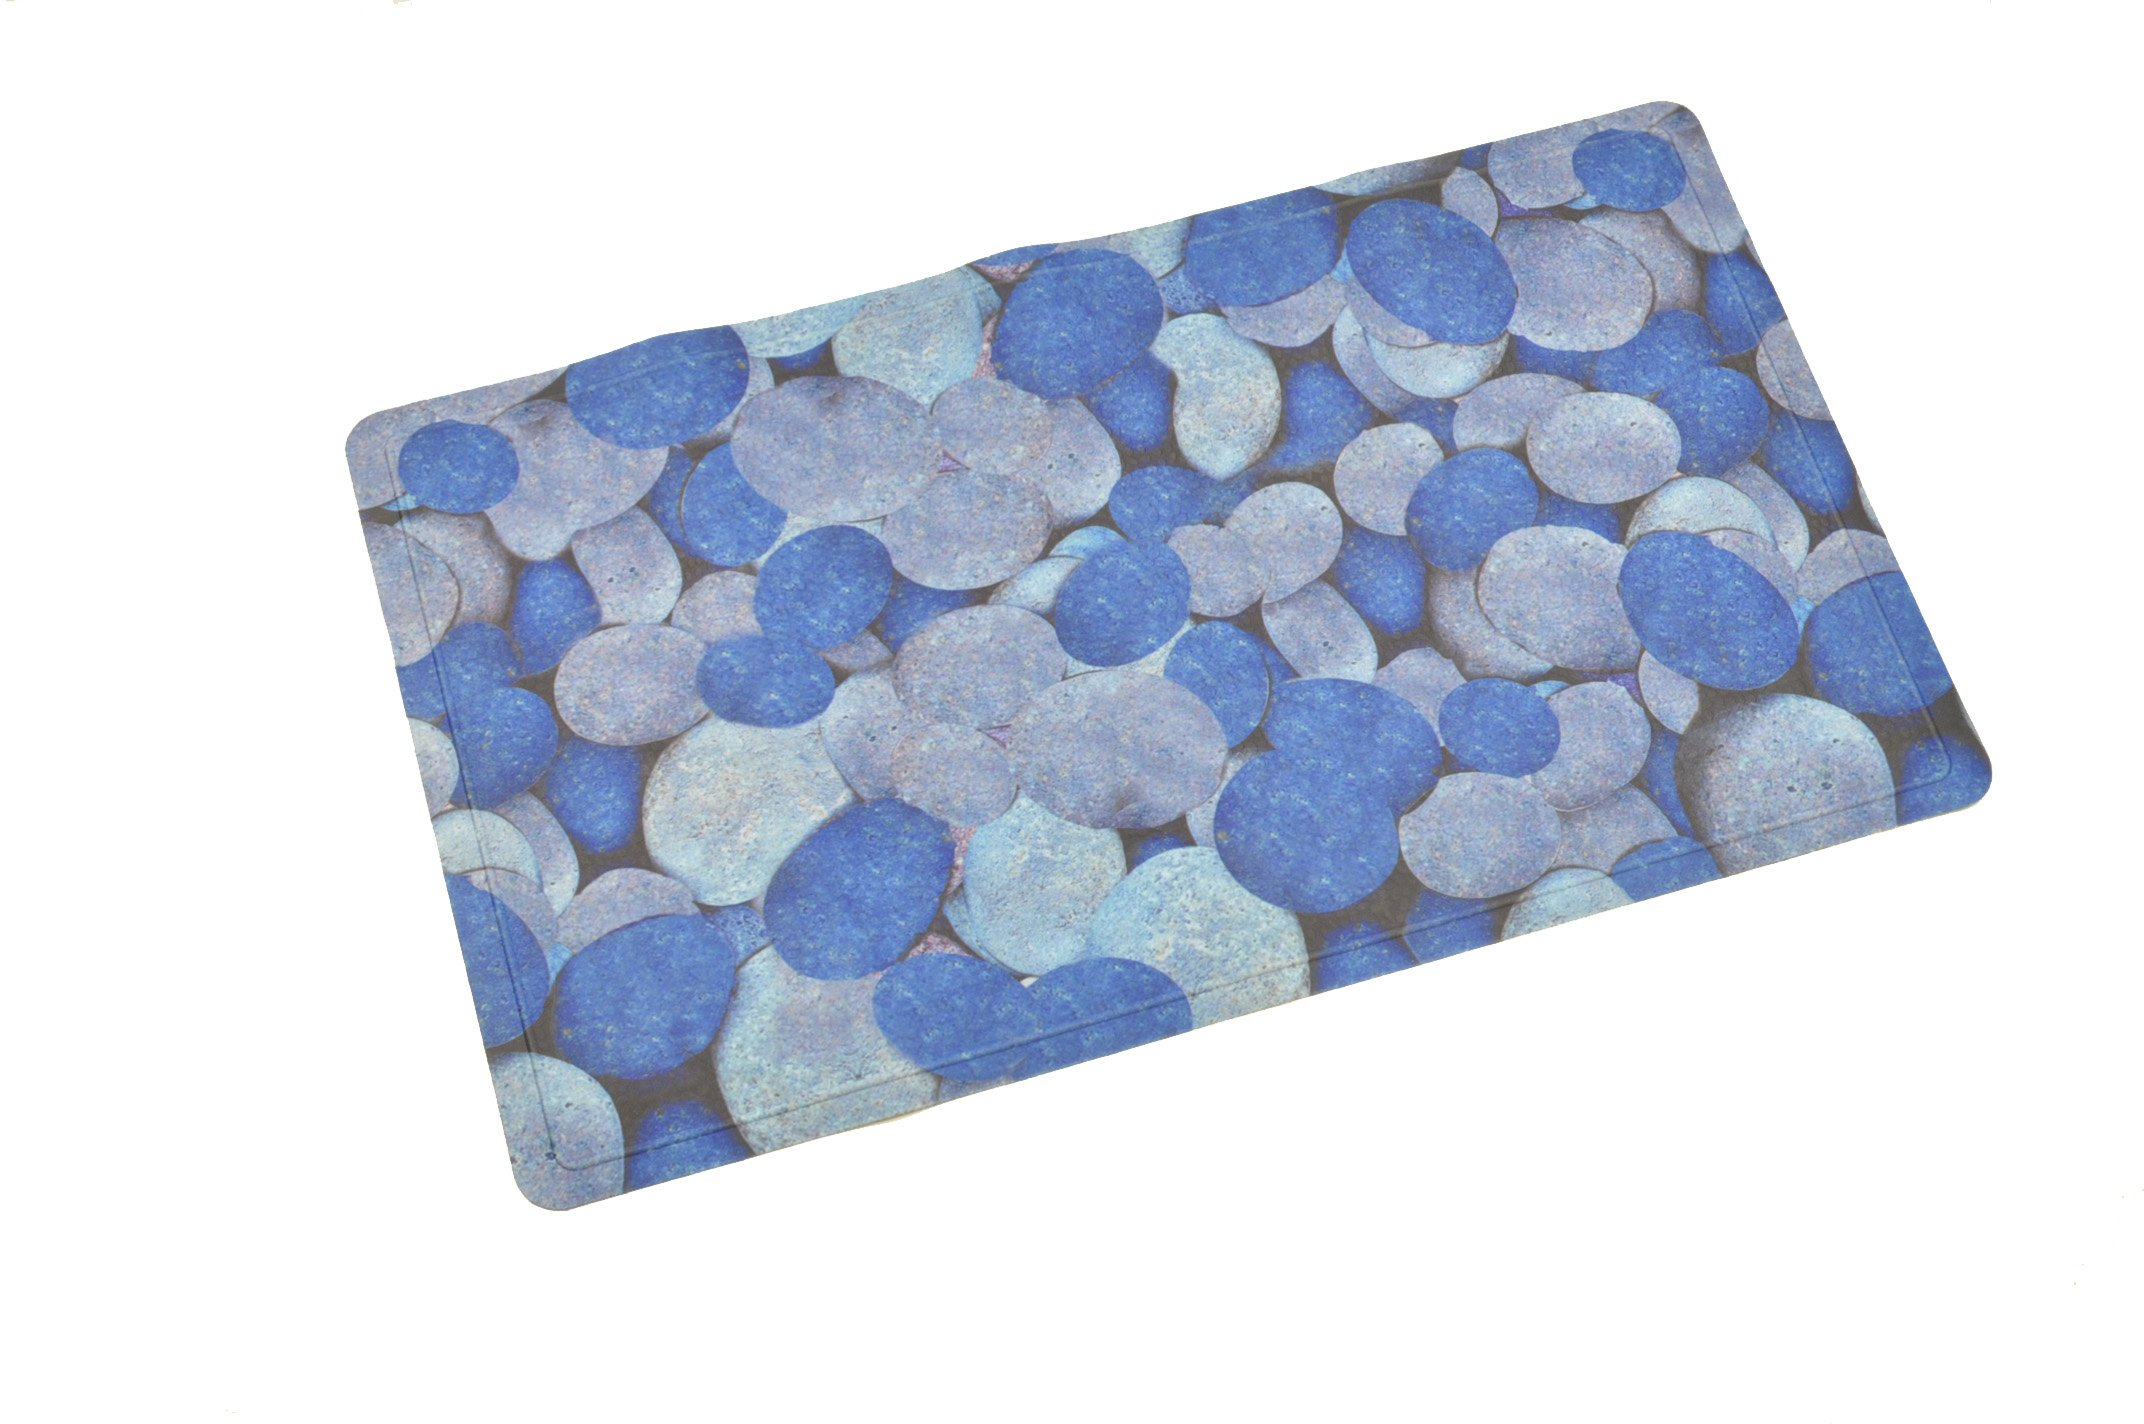 ABELE (R) Design Non Slip Baby Kids Safety Shower Tub Bath Mat, Mildew Mold Resistant Bathmat, Rubber w/ Cloth Coating (Blue Pebble) 15.7'' X 27.5''